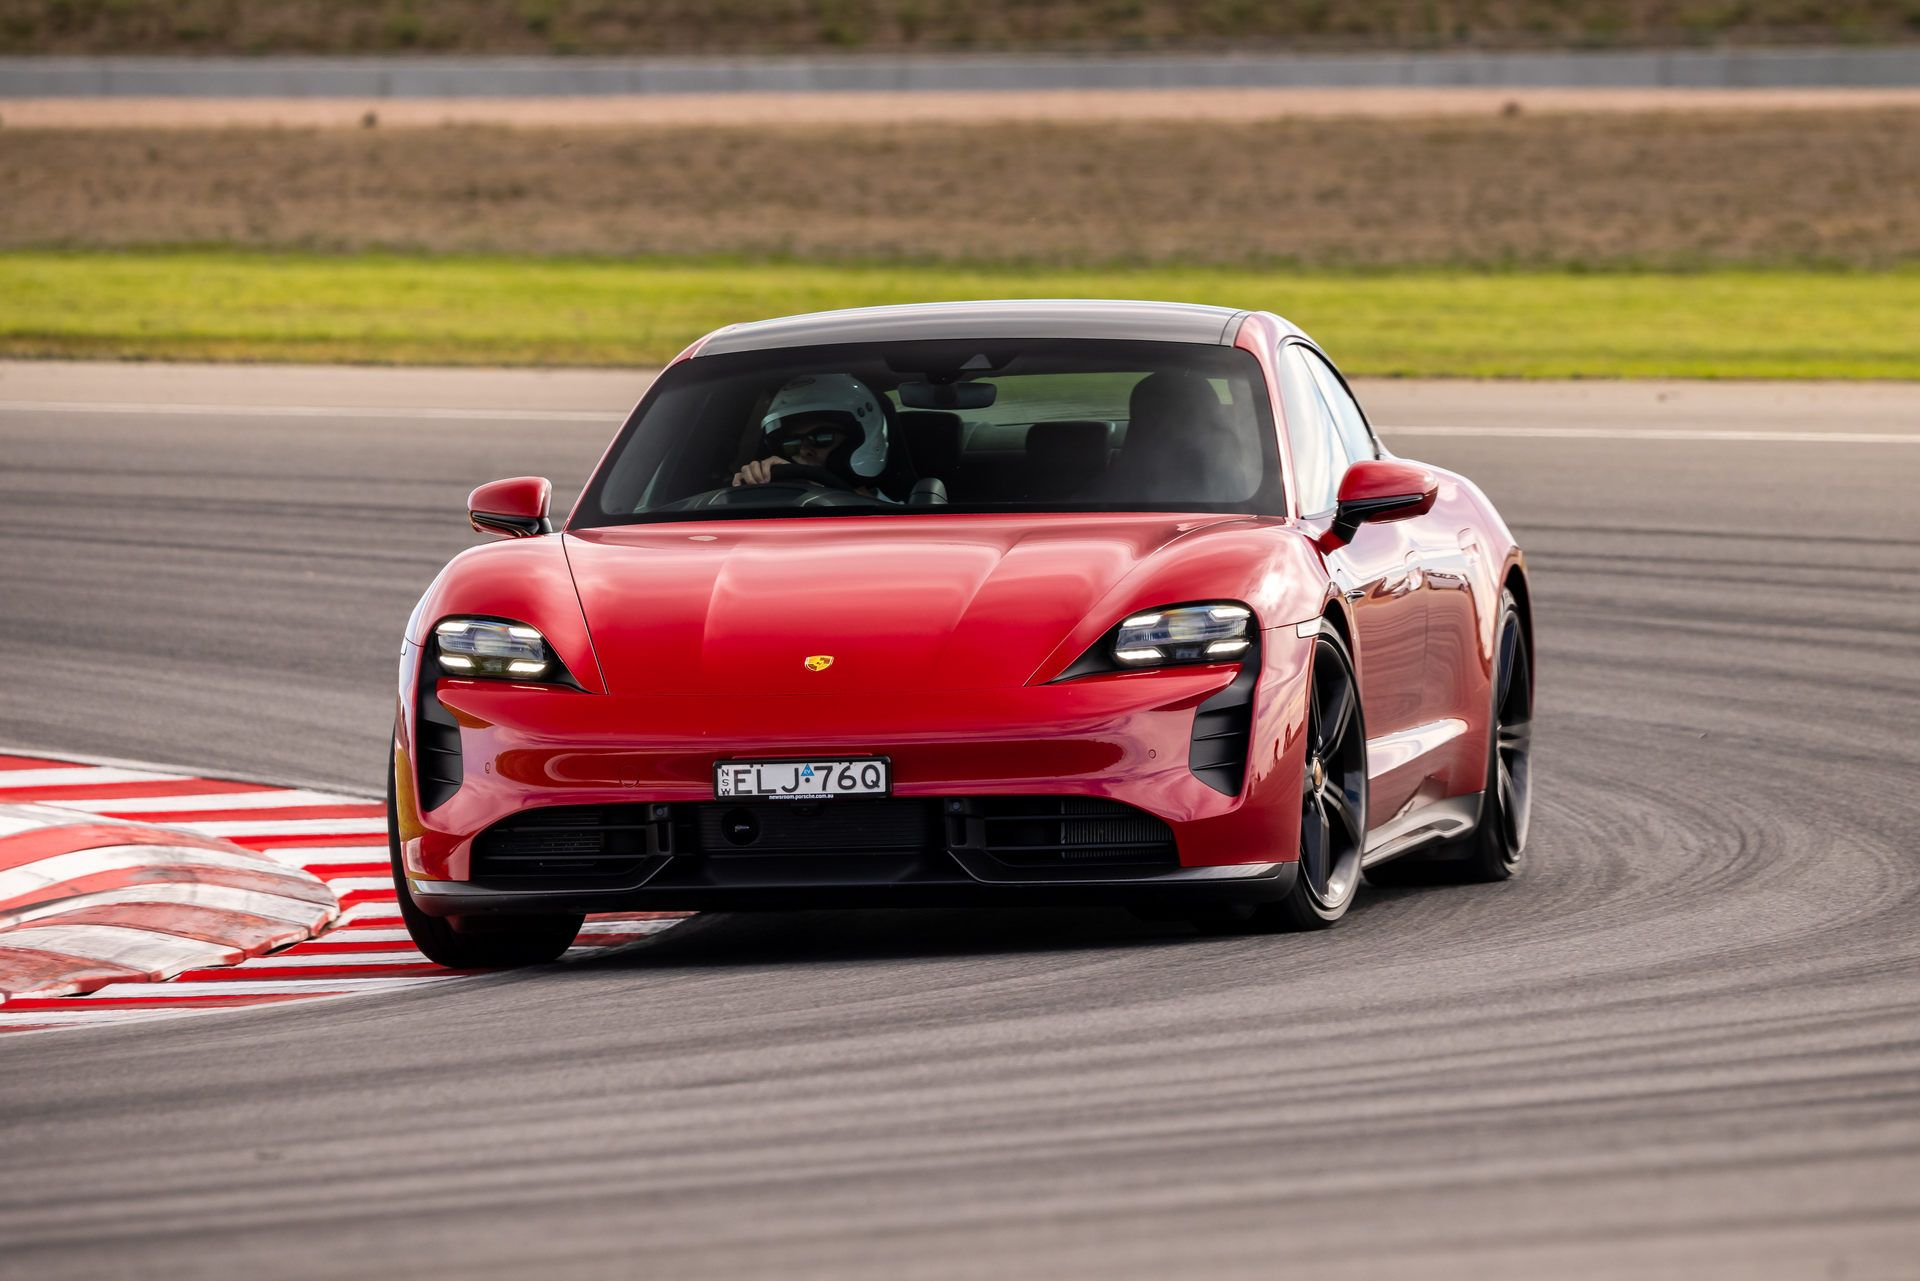 Porsche-Taycan-Turbo-S-The-Bend-Motorsport-Park-6